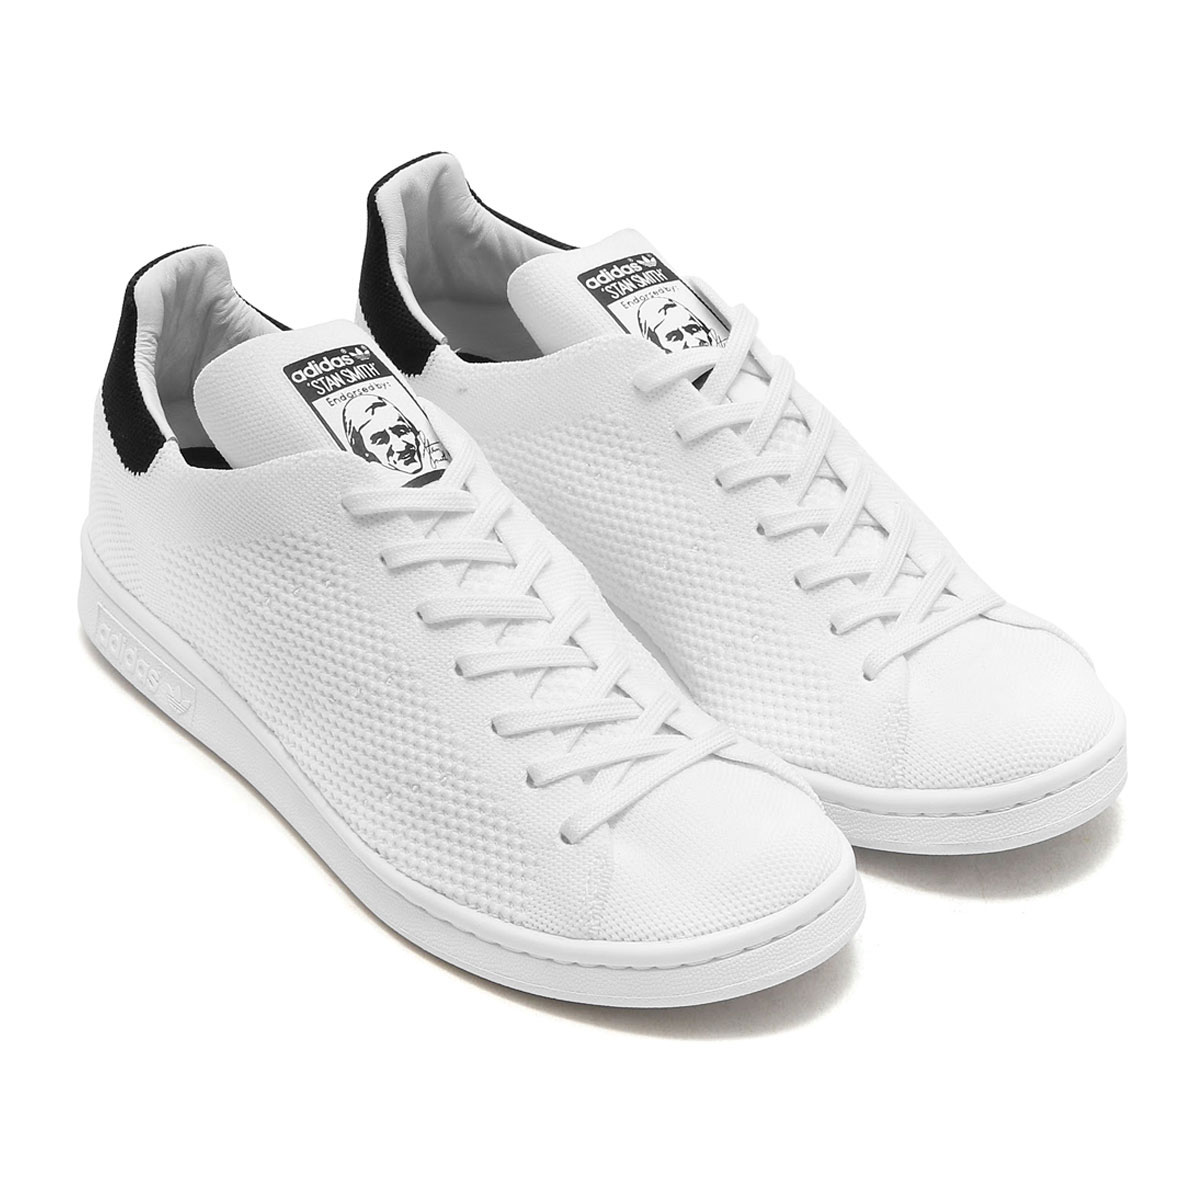 adidas Originals STAN SMITH PK(アディダス オリジナルス スタンスミス PK)(Running White/Running White/Core Black) 【メンズ レディース スニーカー】17FW-I